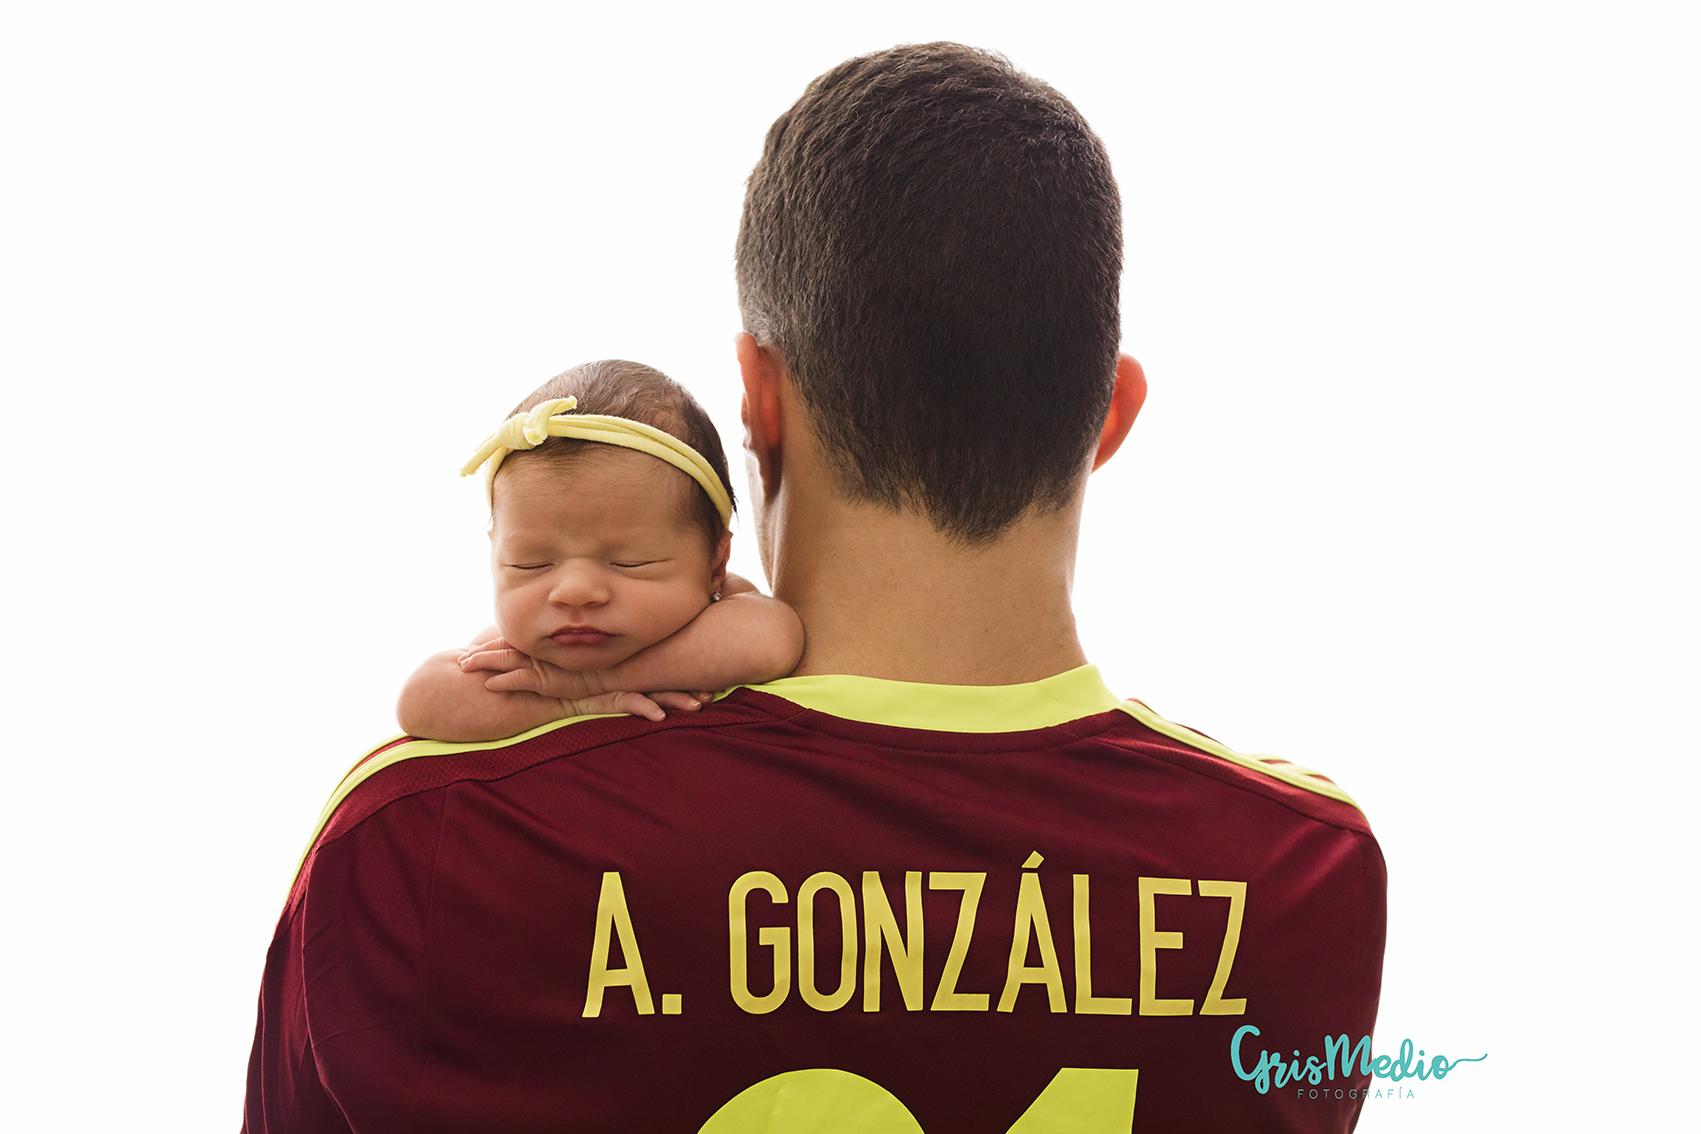 fotografia-especializada-newborn-recien nacido-zaragoza-grismedio-sesion-reportaje-bebe-8